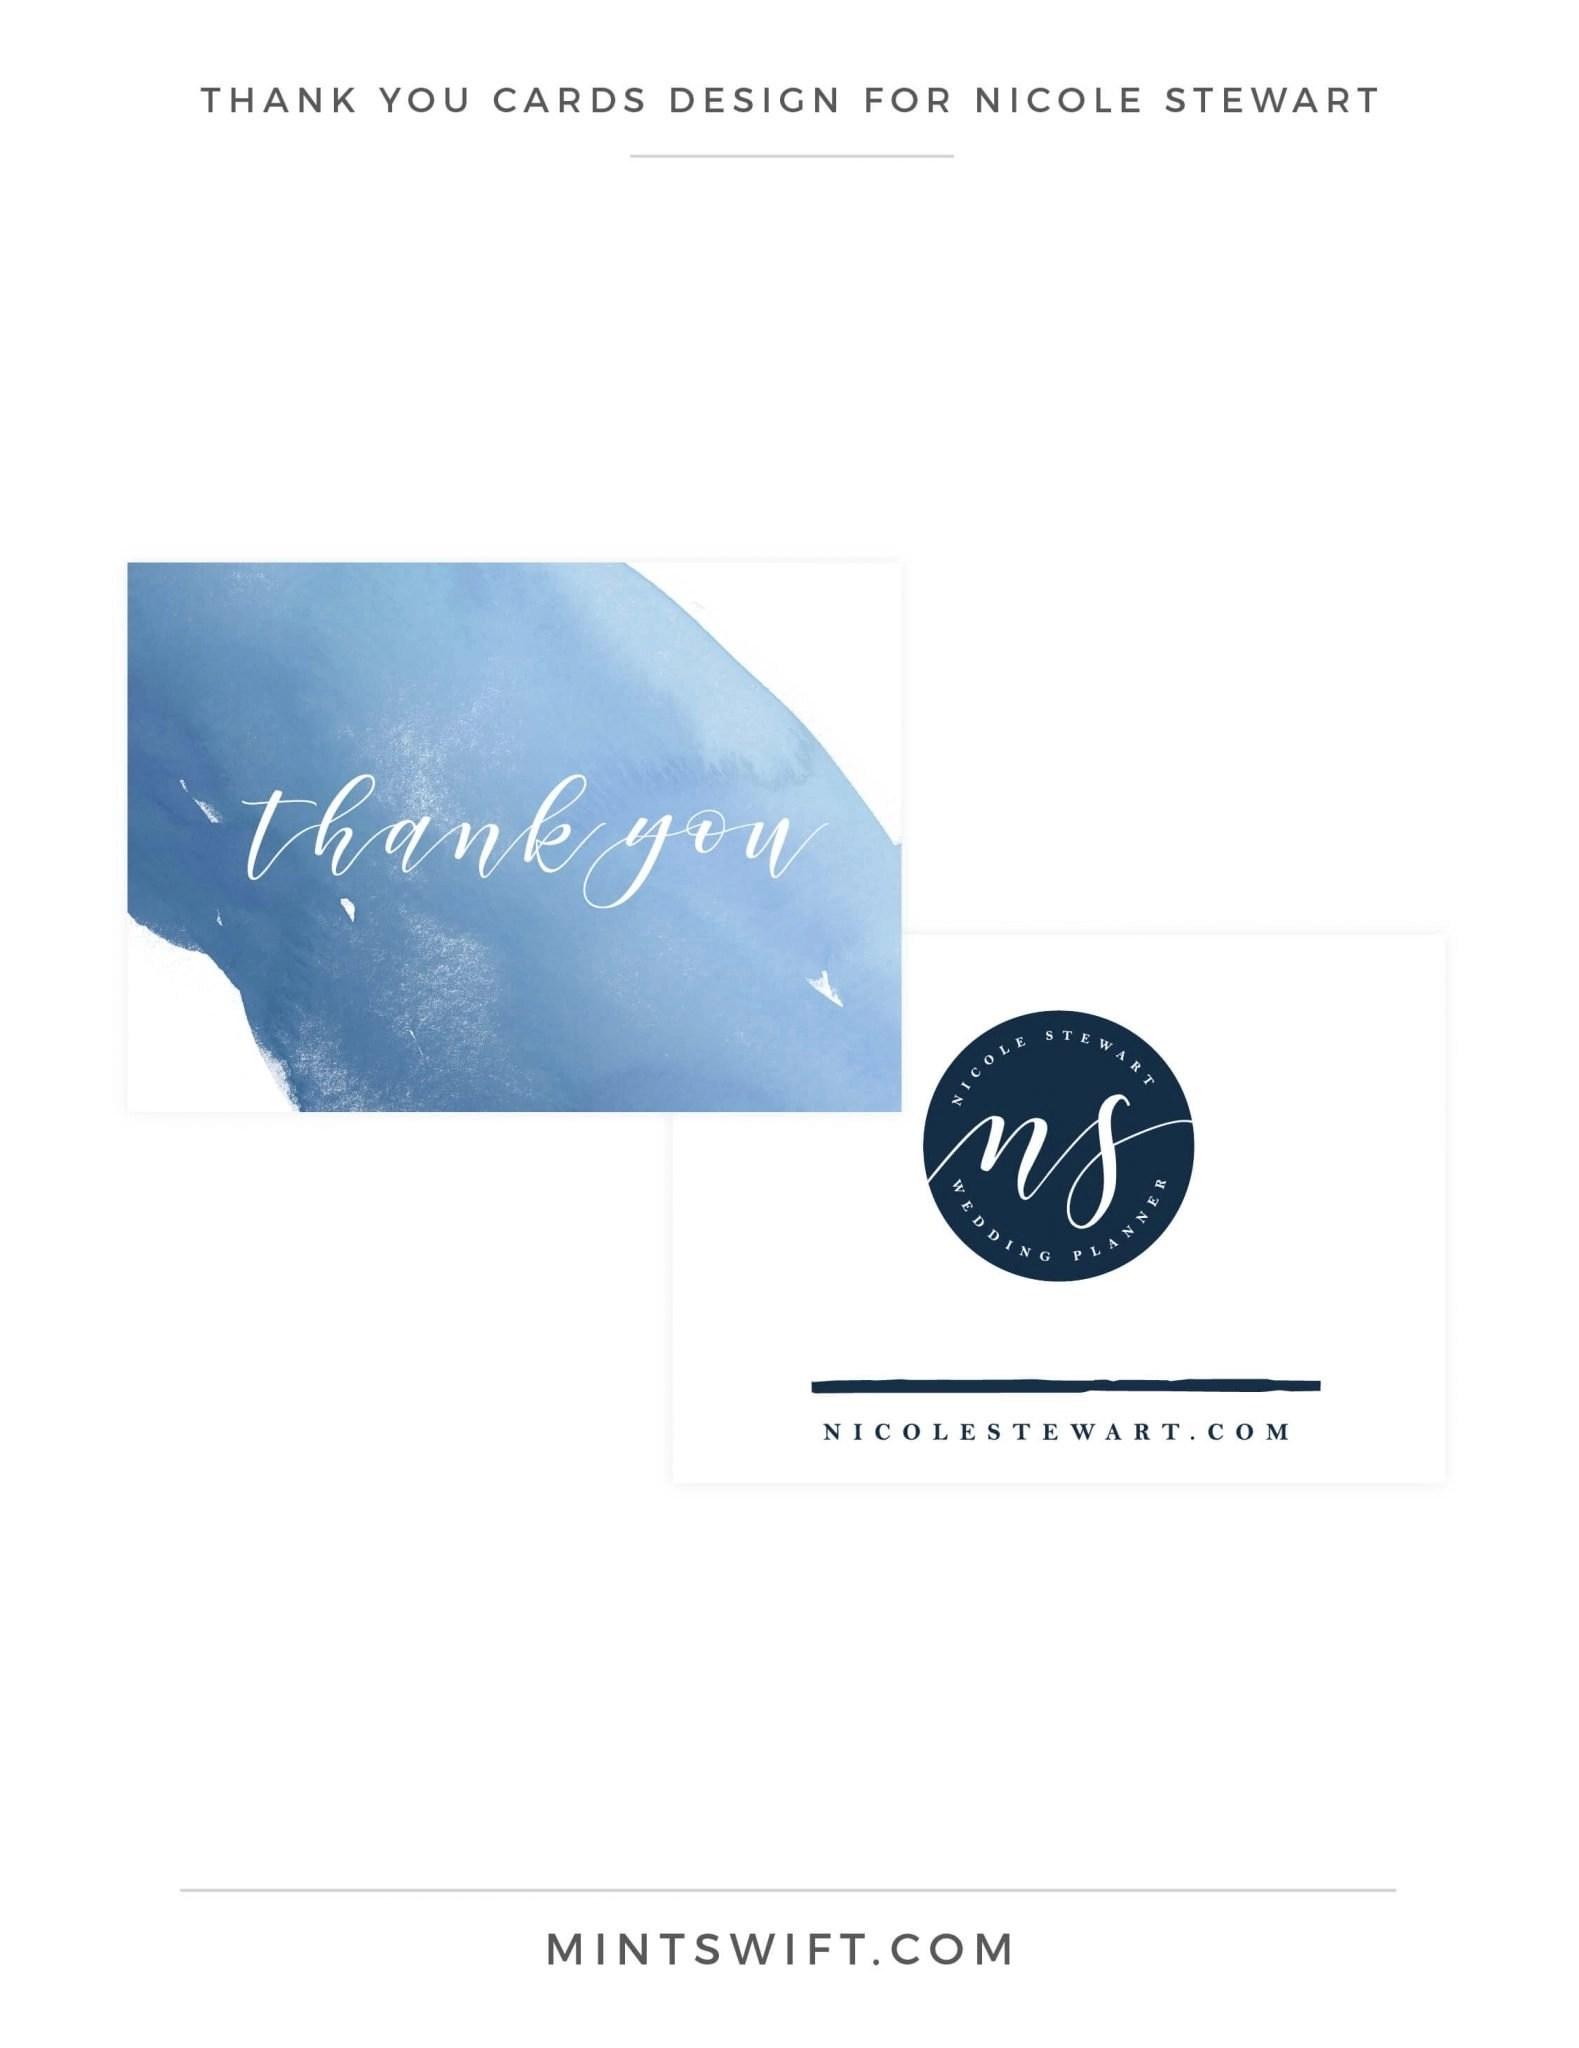 Nicole Stewart - Thank You Cards Design - Brand Design Package - MintSwift